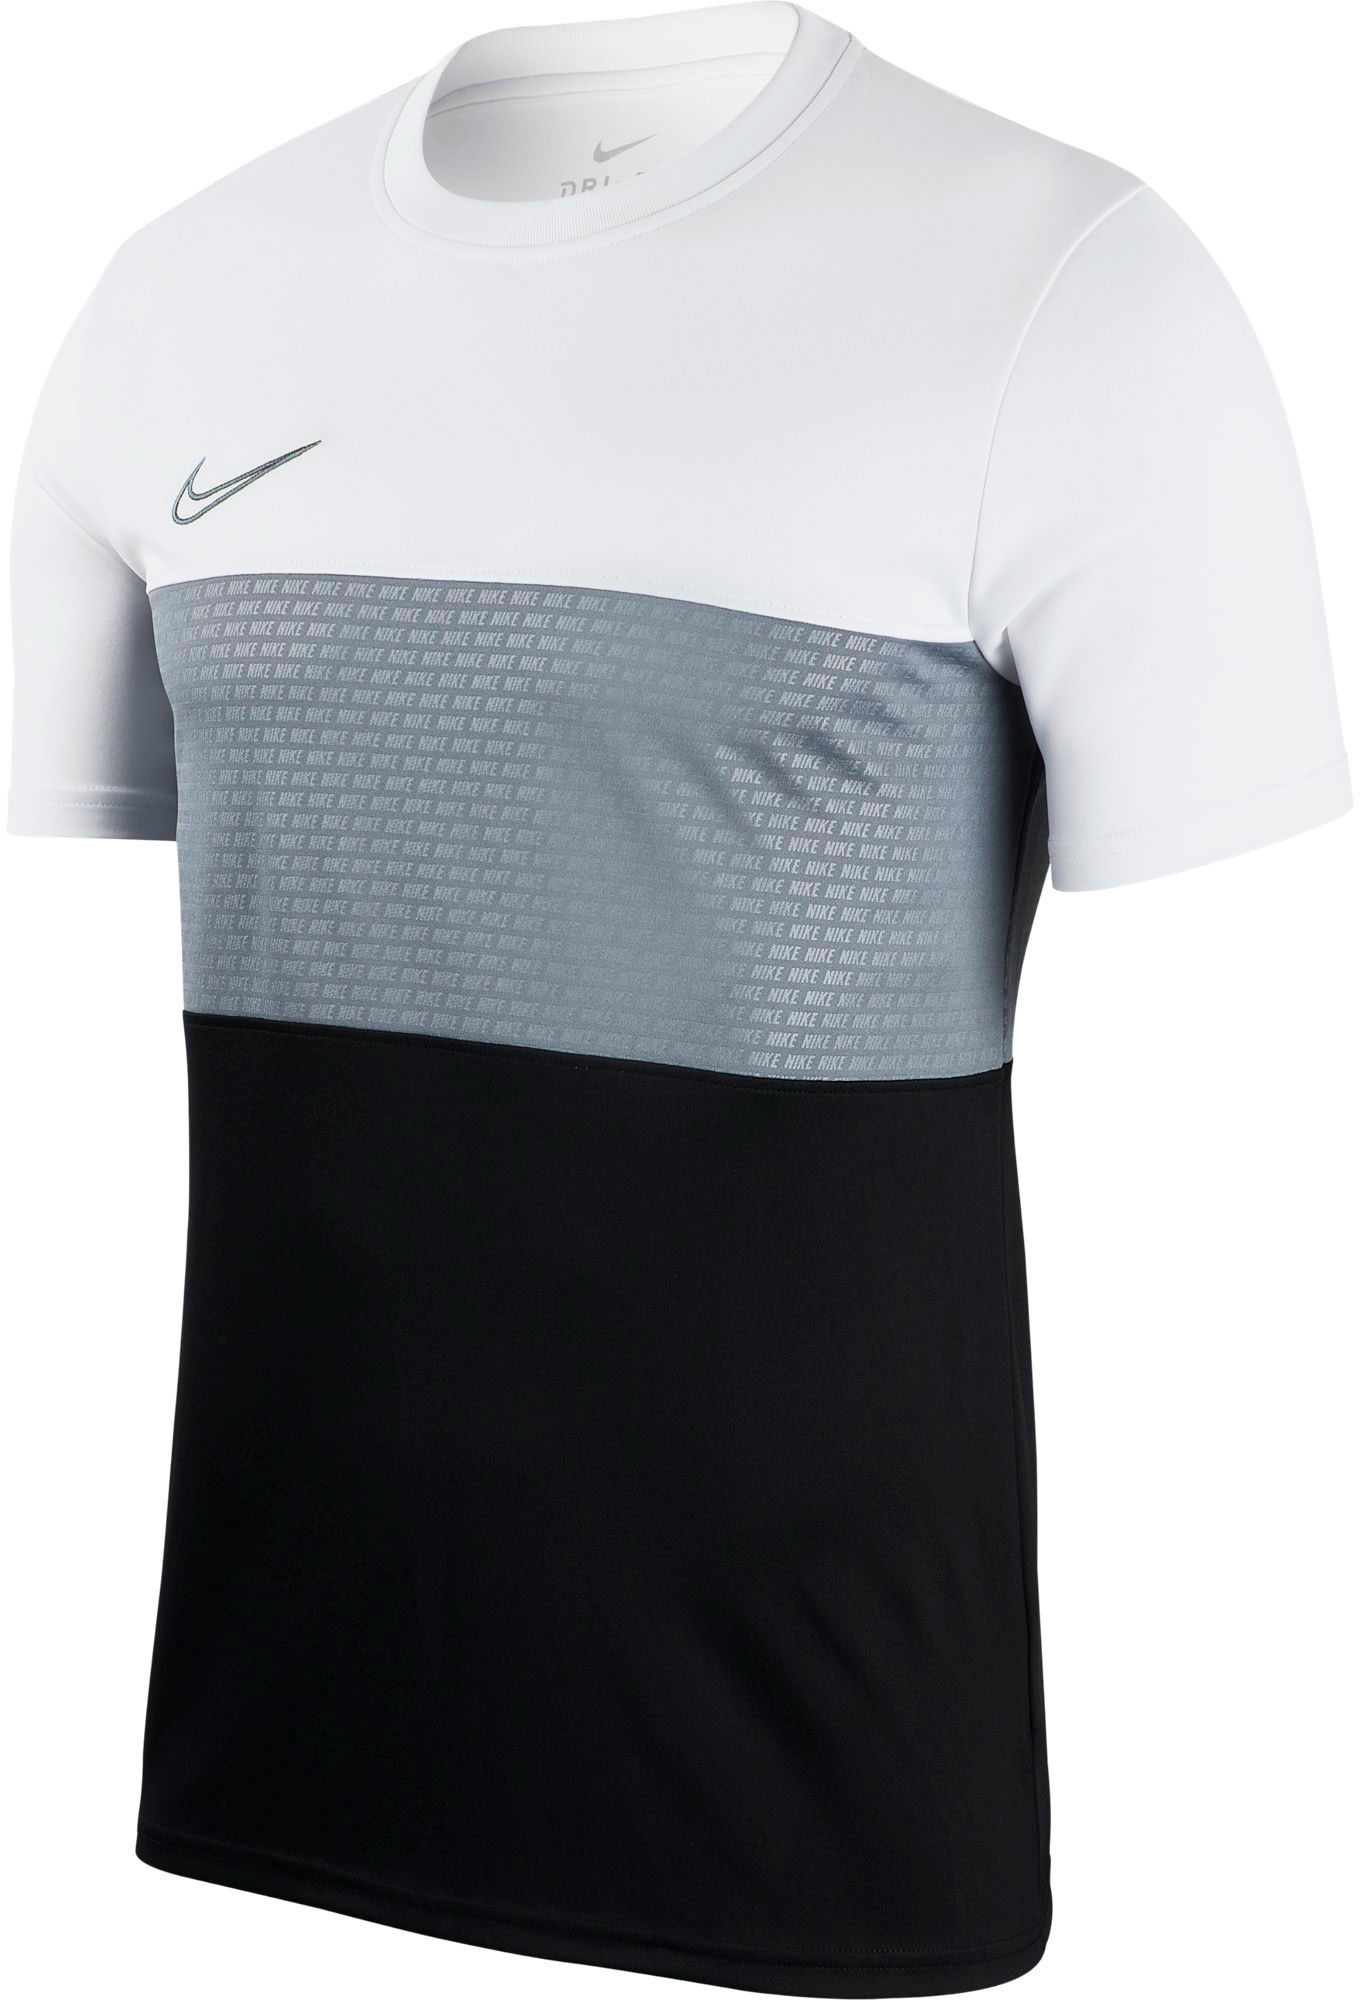 Zwart wit heren t-shirt met grijze print Nike Dry Academy GX - AJ9998 102